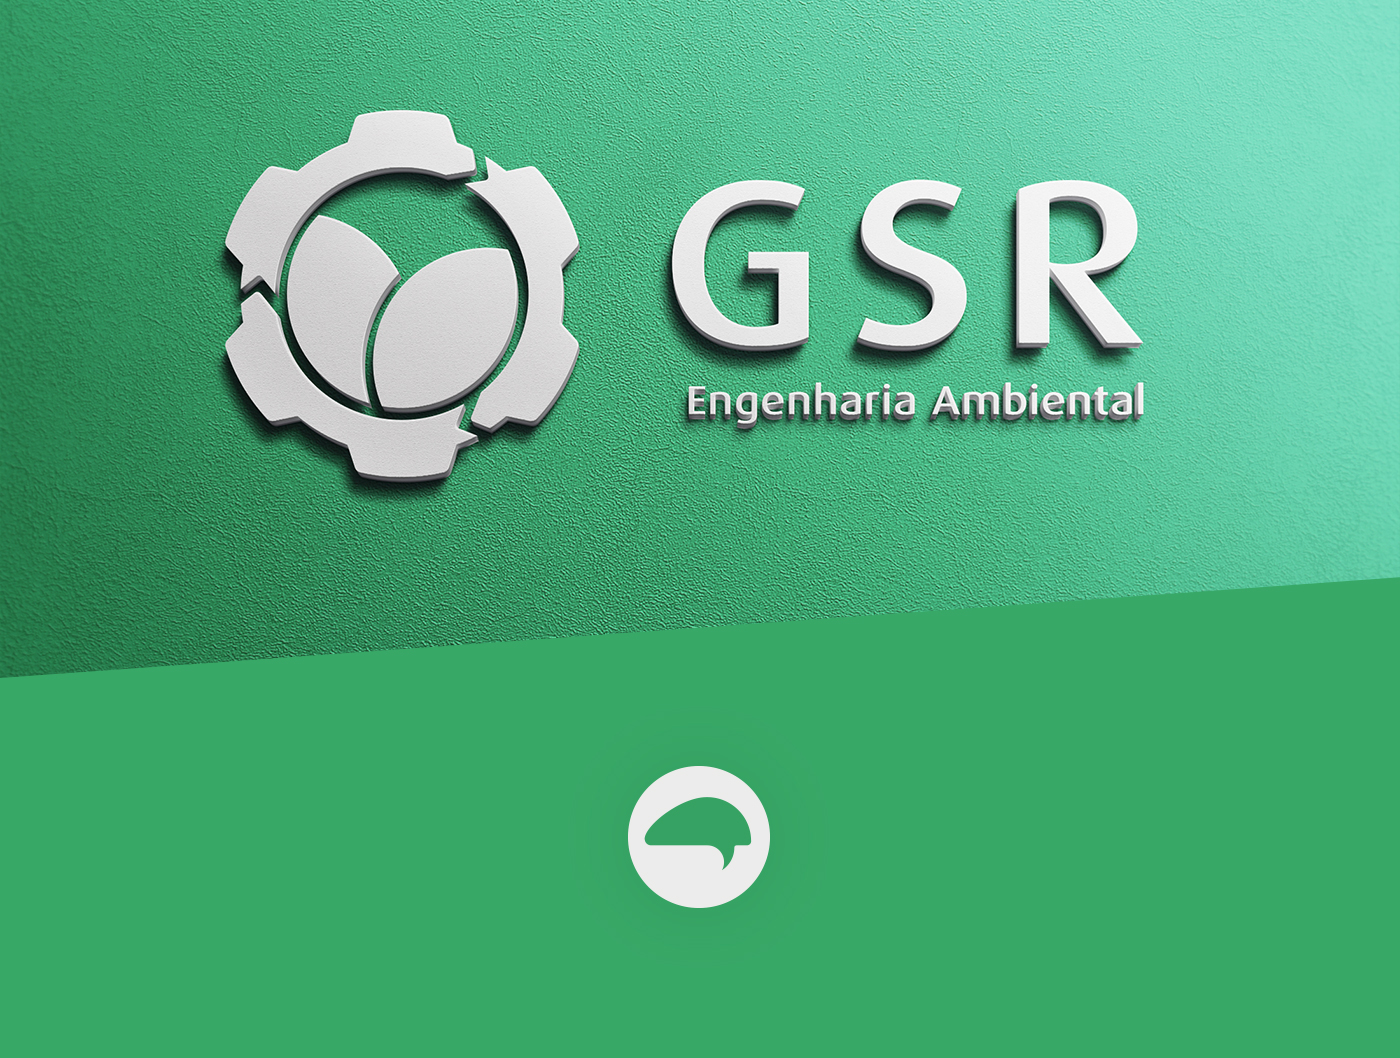 environmental engineering engineerring environment engenharia ambiental Engenharia mark logo Corporate Identity visual identity green Sorocaba